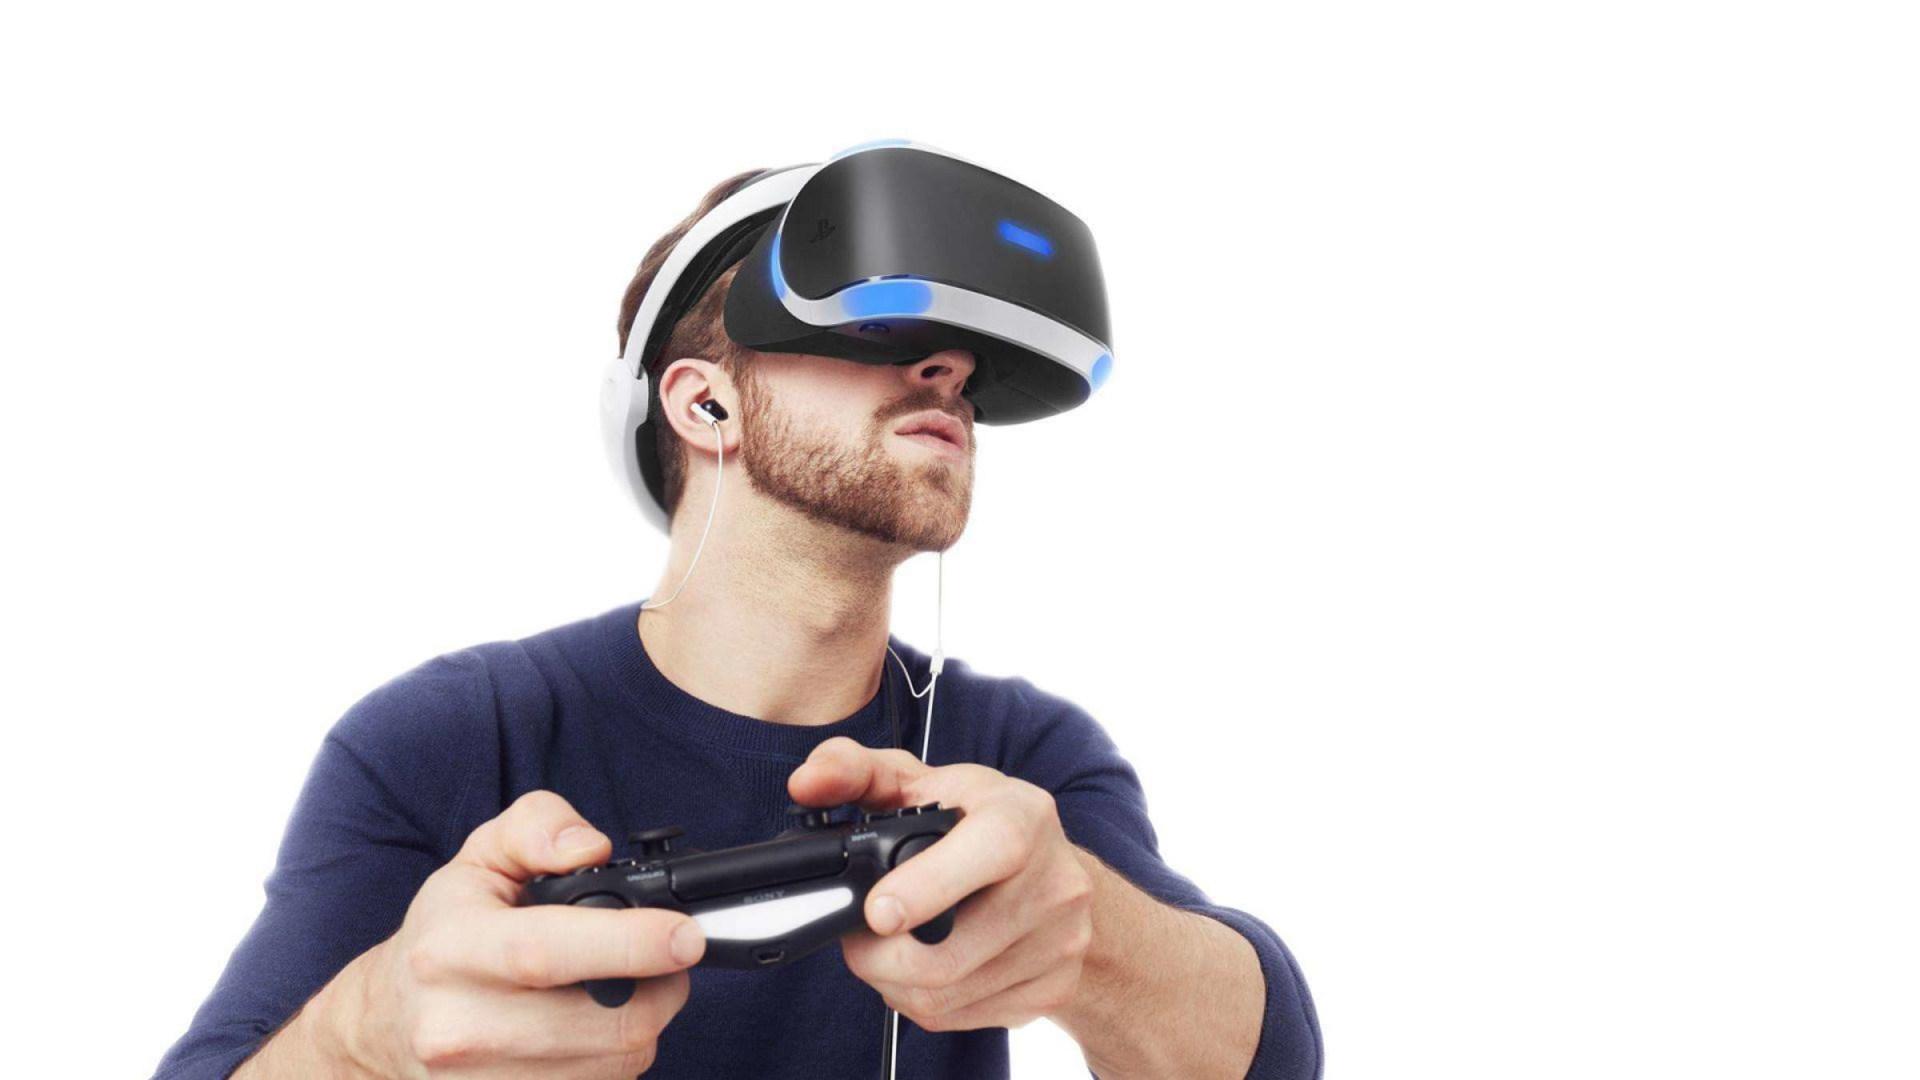 Sony, PlayStation 4, Playstation, PS4, Sony PlayStation 4, Virtual Reality, Sony PS4, PlayStation VR, PSVR